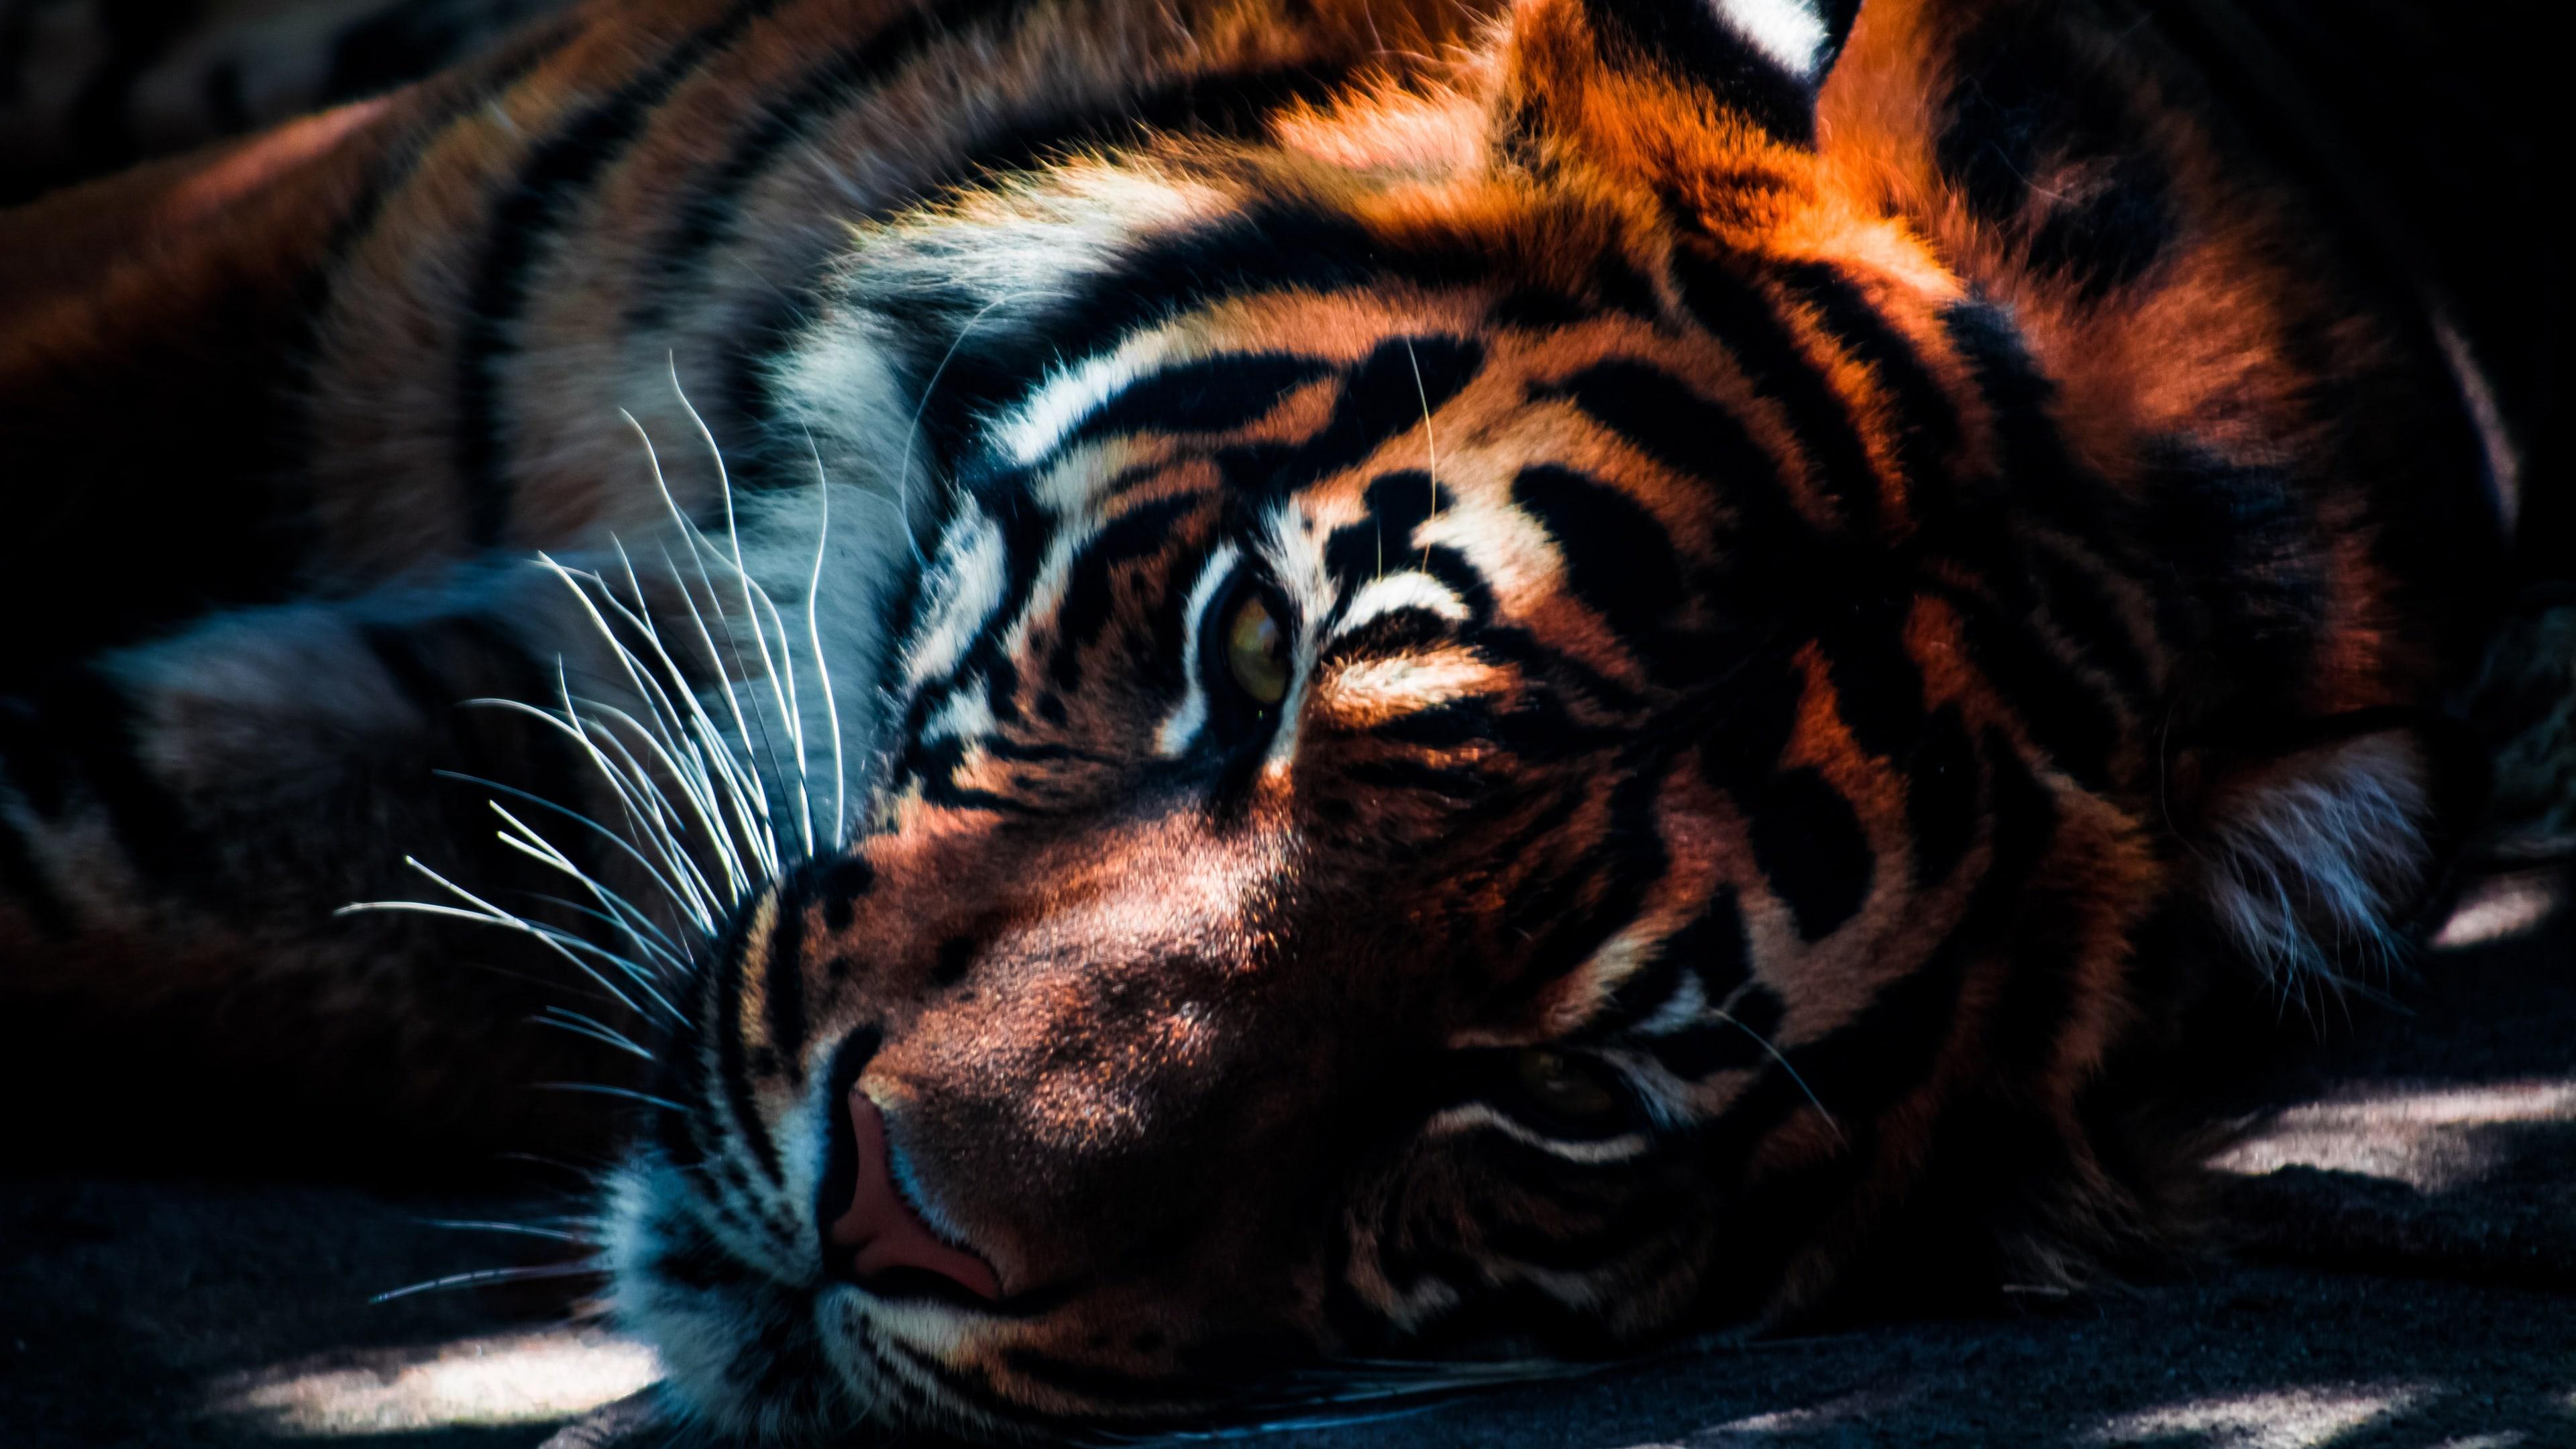 Tiger HD Wallpapers | 7wallpapers net